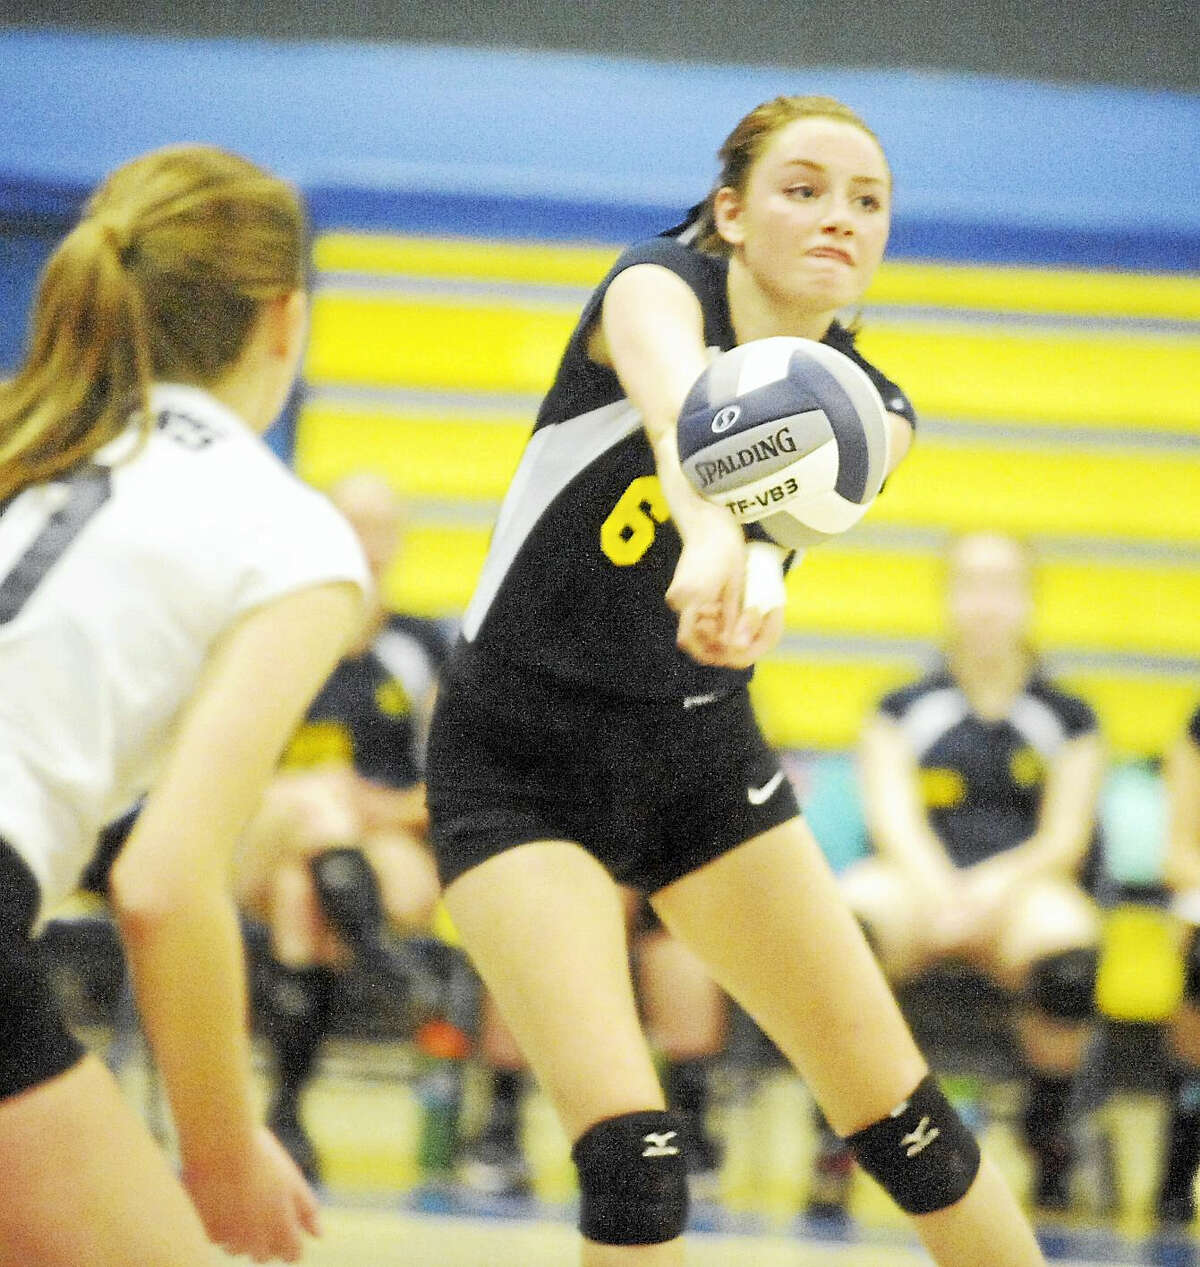 Haddam-Killingworth senior Sarah Porter had nine kills in the Cougars' 3-0 SLC semifinal win over Coginchaug on Wednesday.